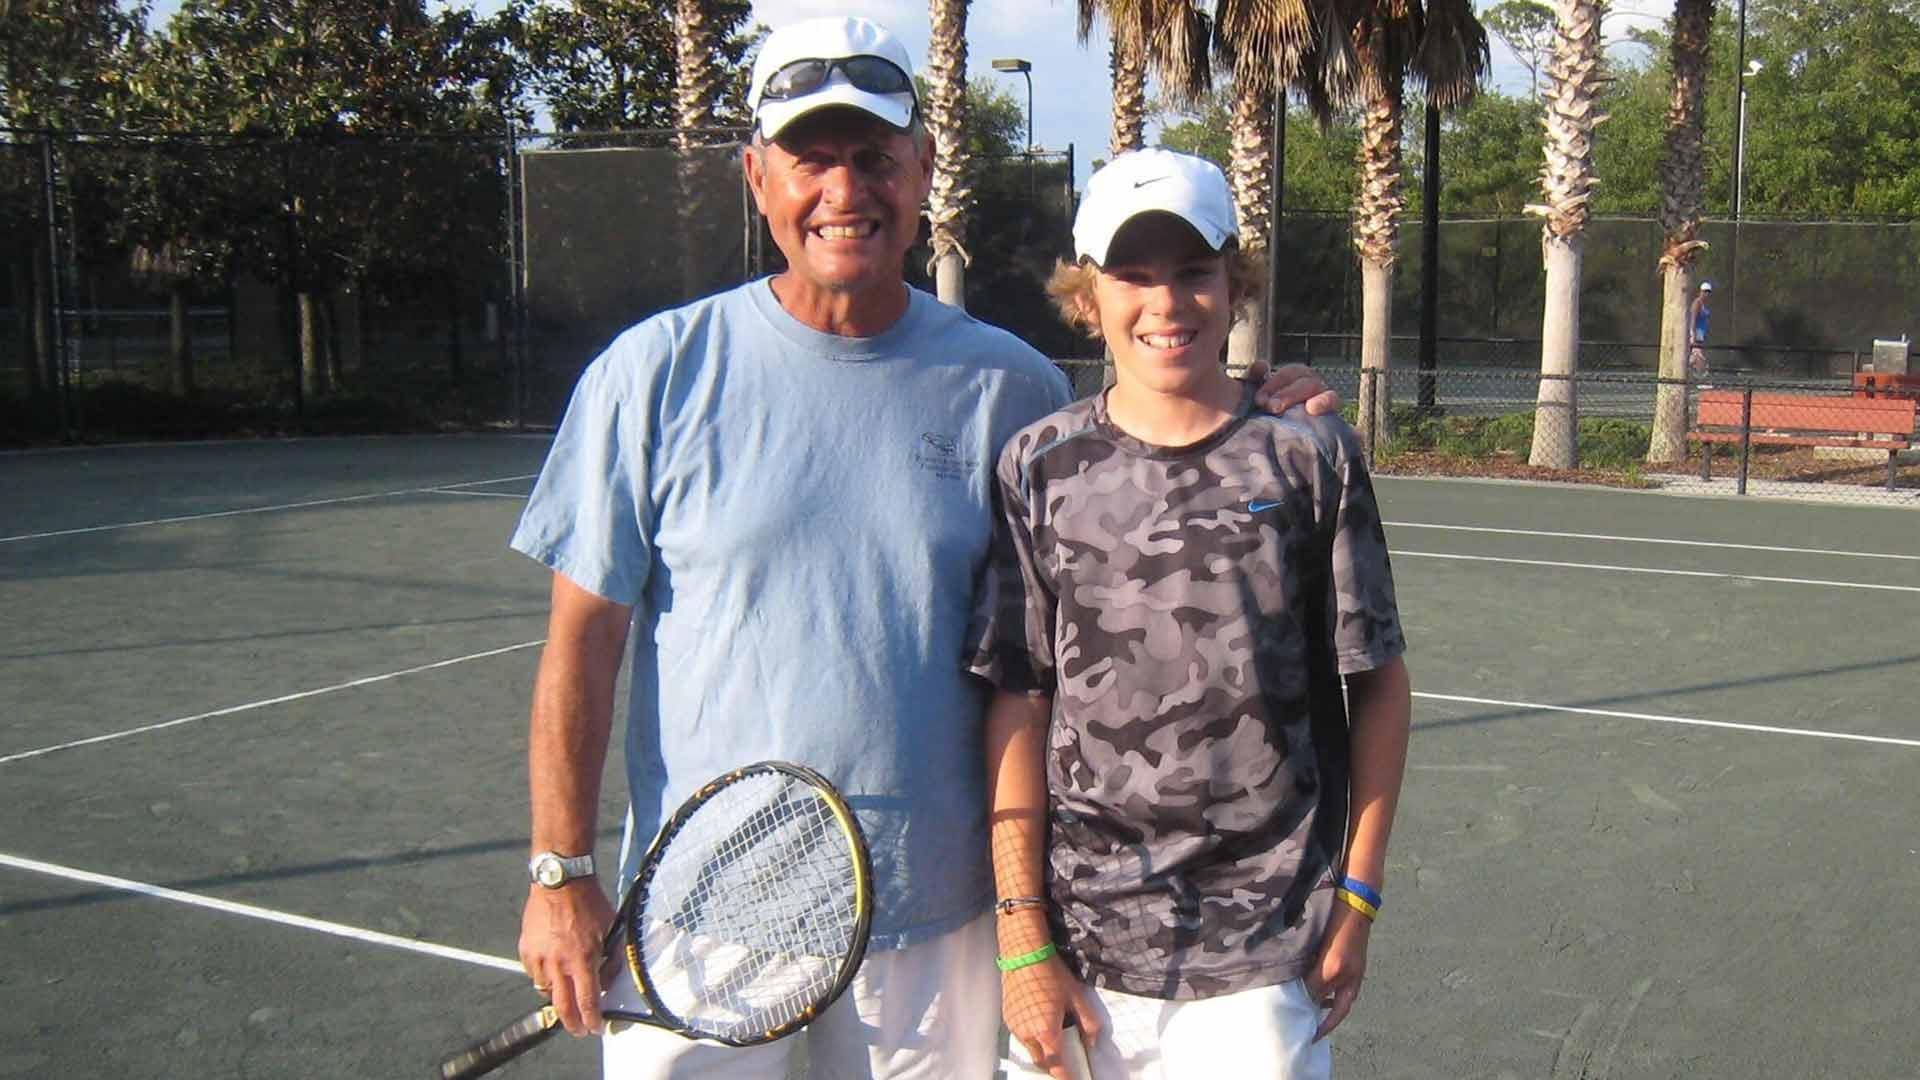 <a href='/en/players/tom-gullikson/g049/overview'>Tom Gullikson</a> has been instrumental in <a href='/en/players/reilly-opelka/o522/overview'>Reilly Opelka</a>'s career.